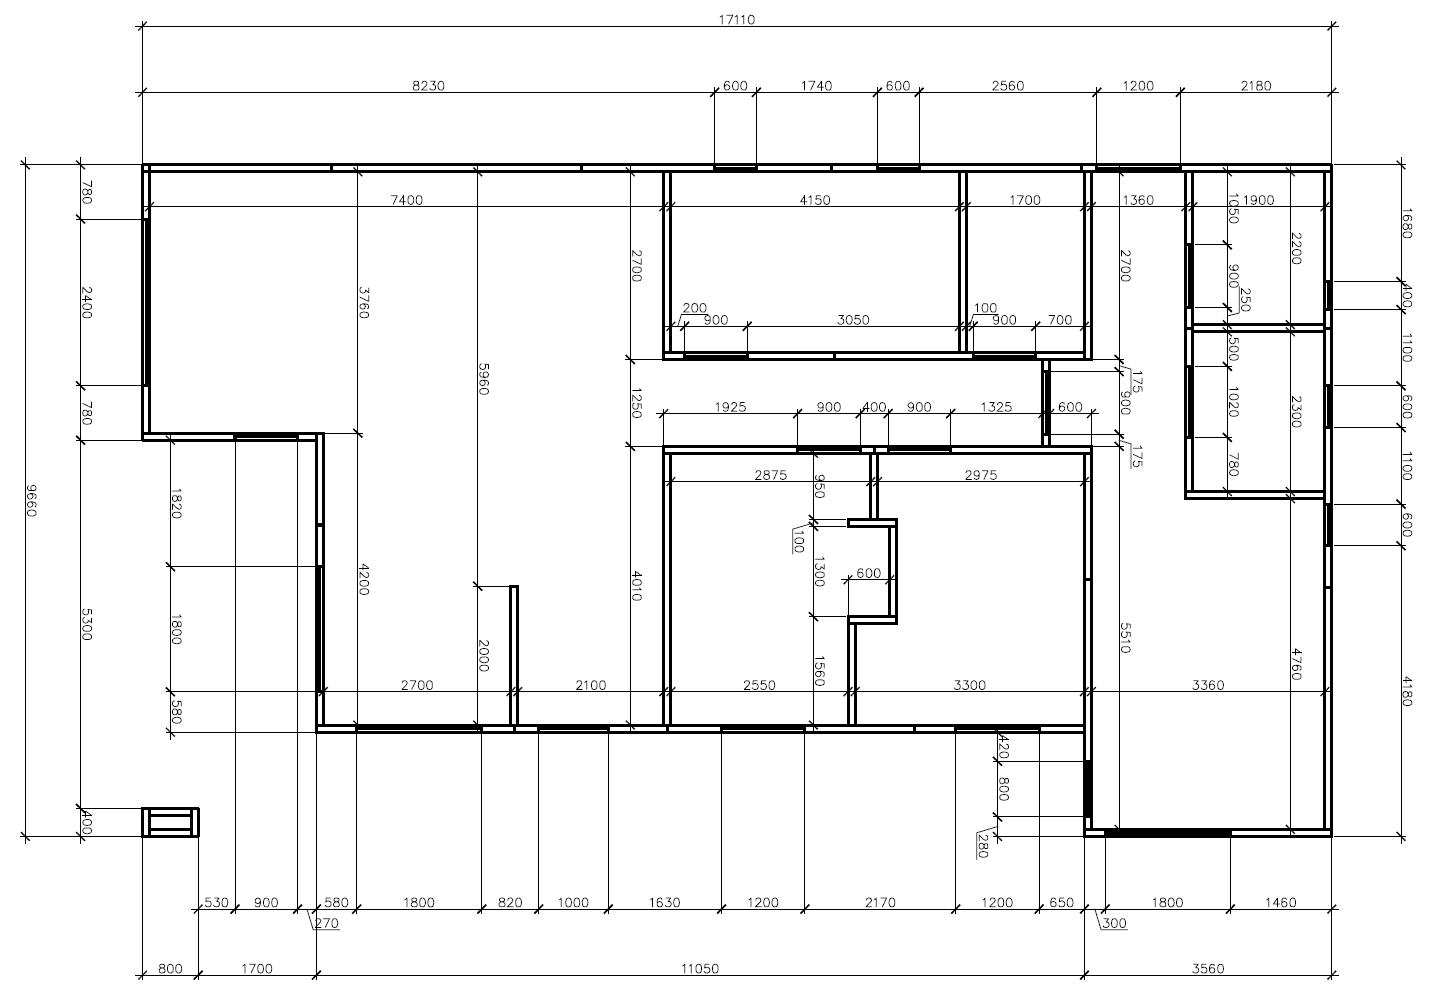 2020-10-08_10-40-04